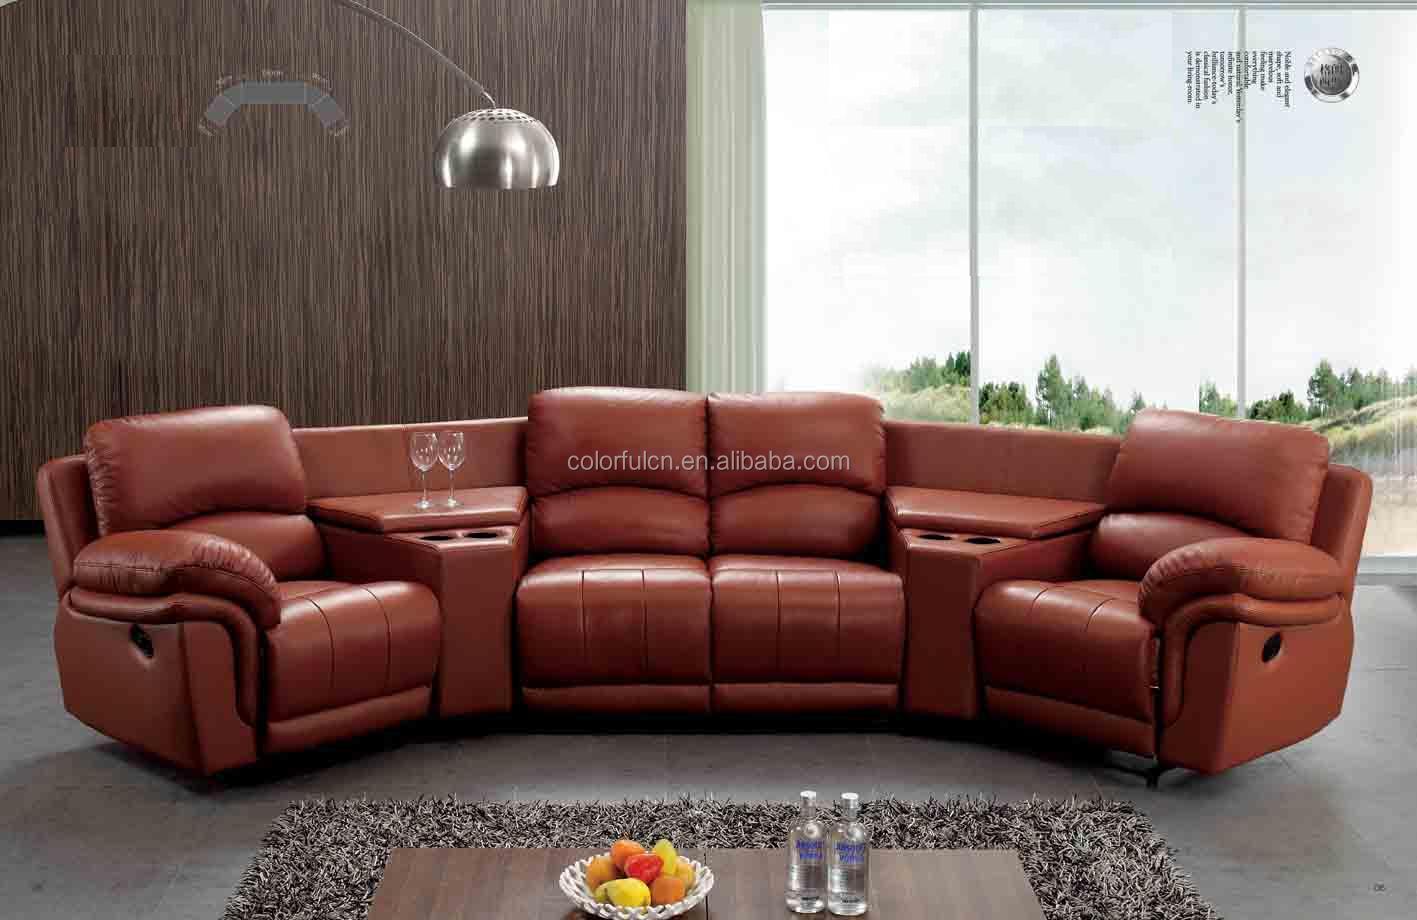 sofa buy cheap leather sofa set low price sofa set sofa set in